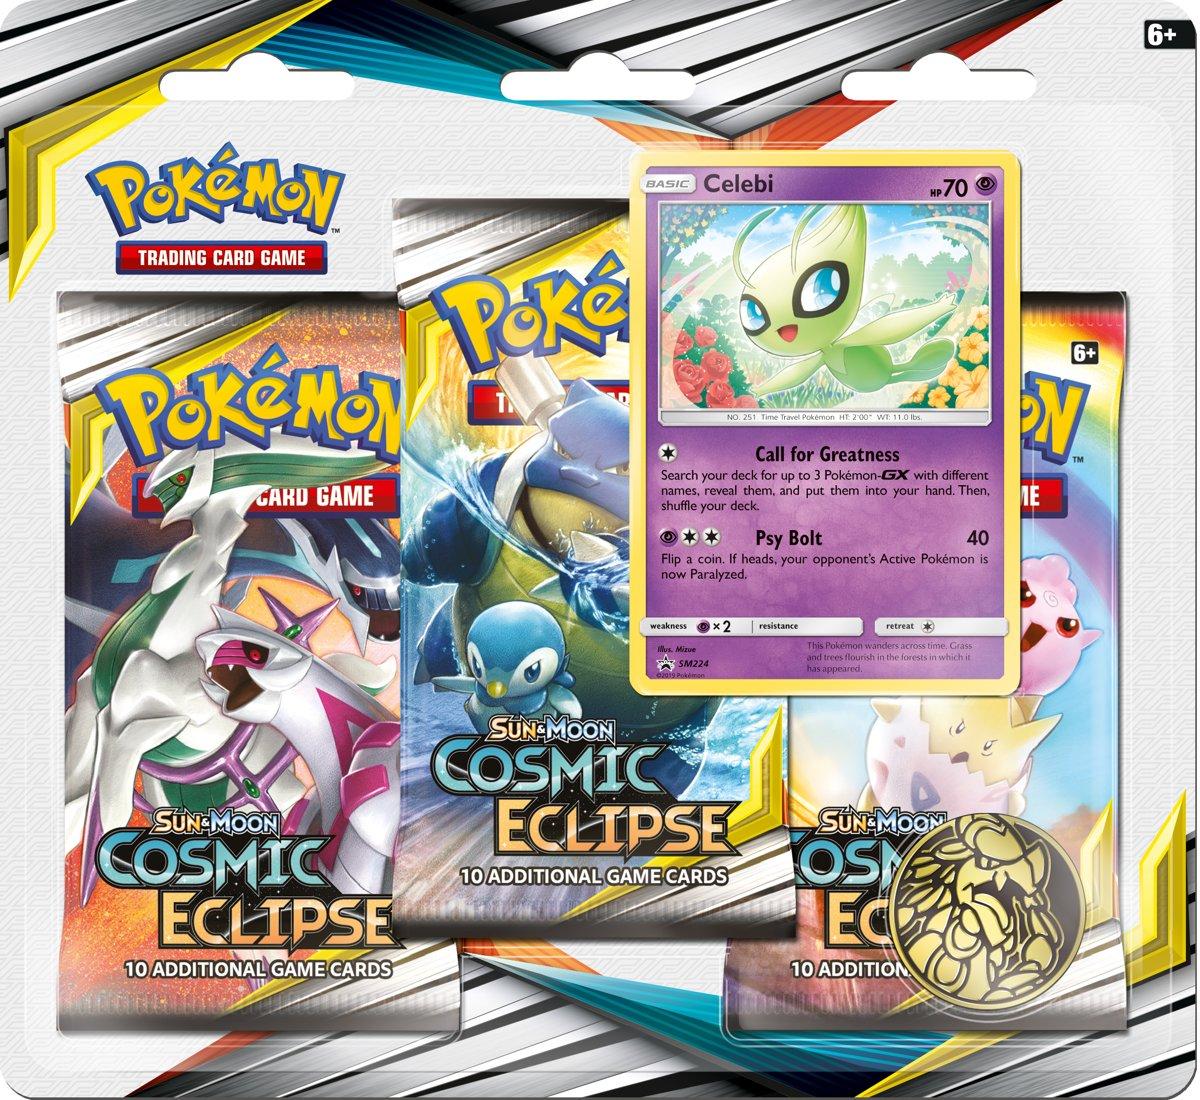 Pokémon Sun & Moon Cosmic Eclipse 3BoosterBlister Celibi - Pokémon Kaarten kopen